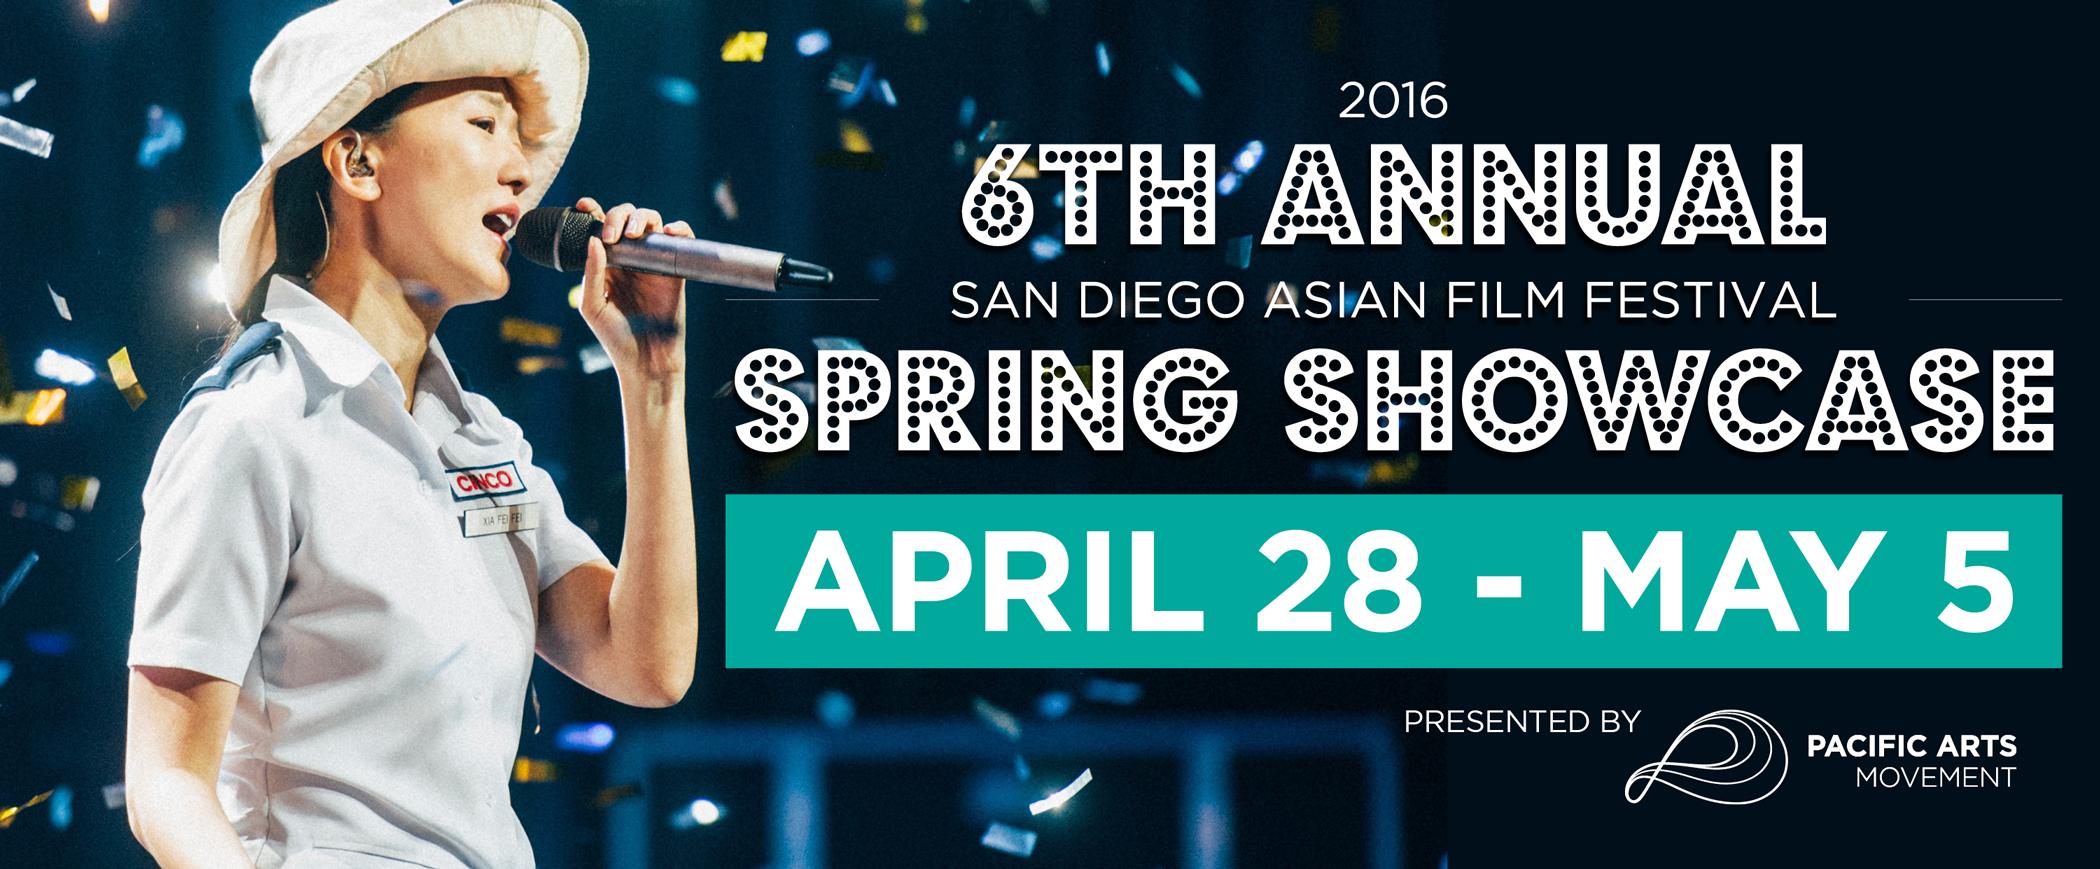 2016 SDAFF Spring Showcase